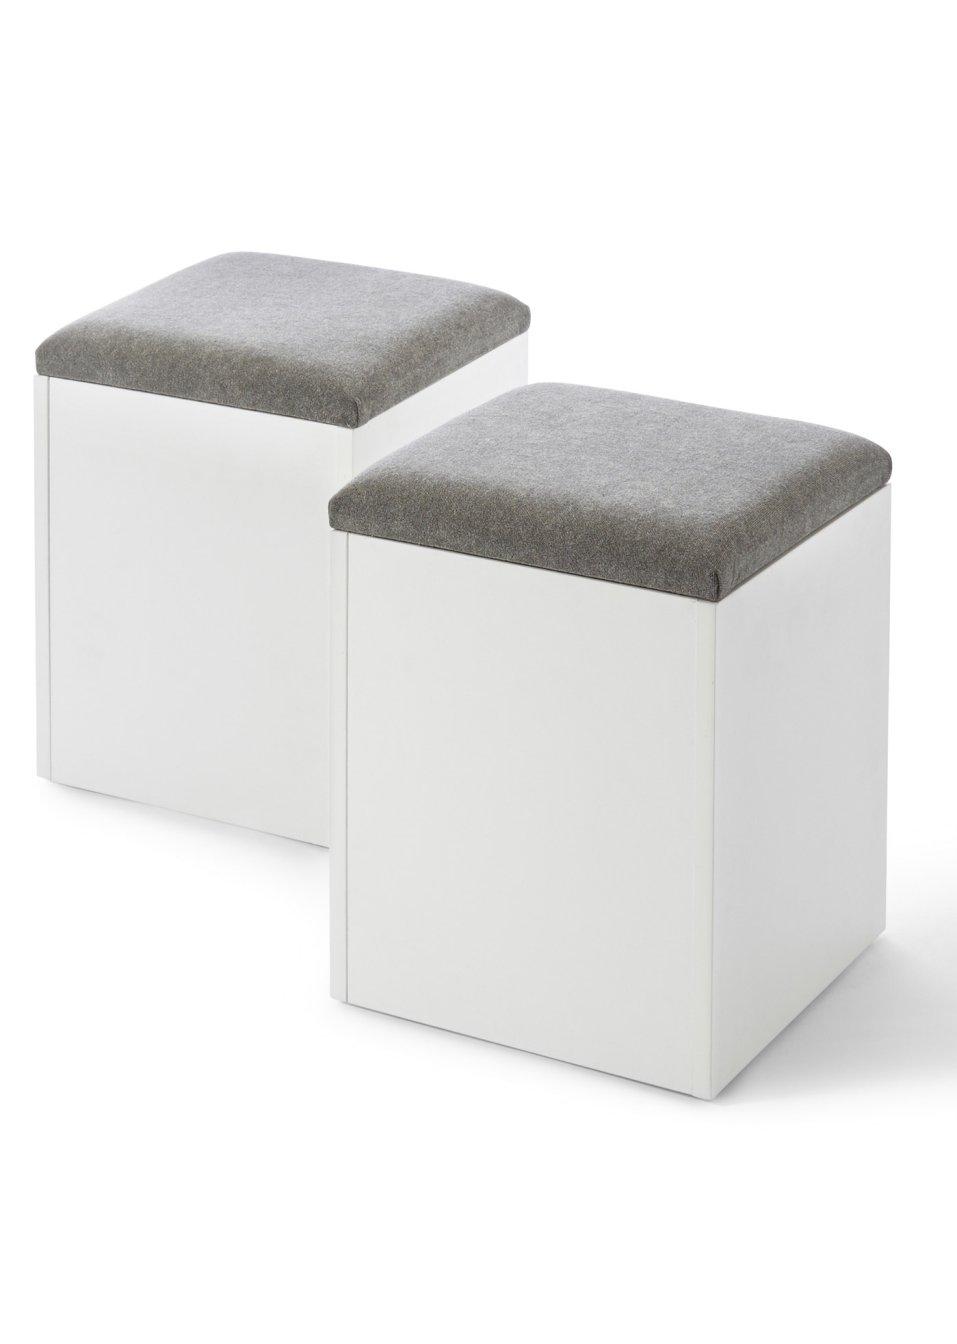 hocker klara wei grau bpc living online bestellen. Black Bedroom Furniture Sets. Home Design Ideas